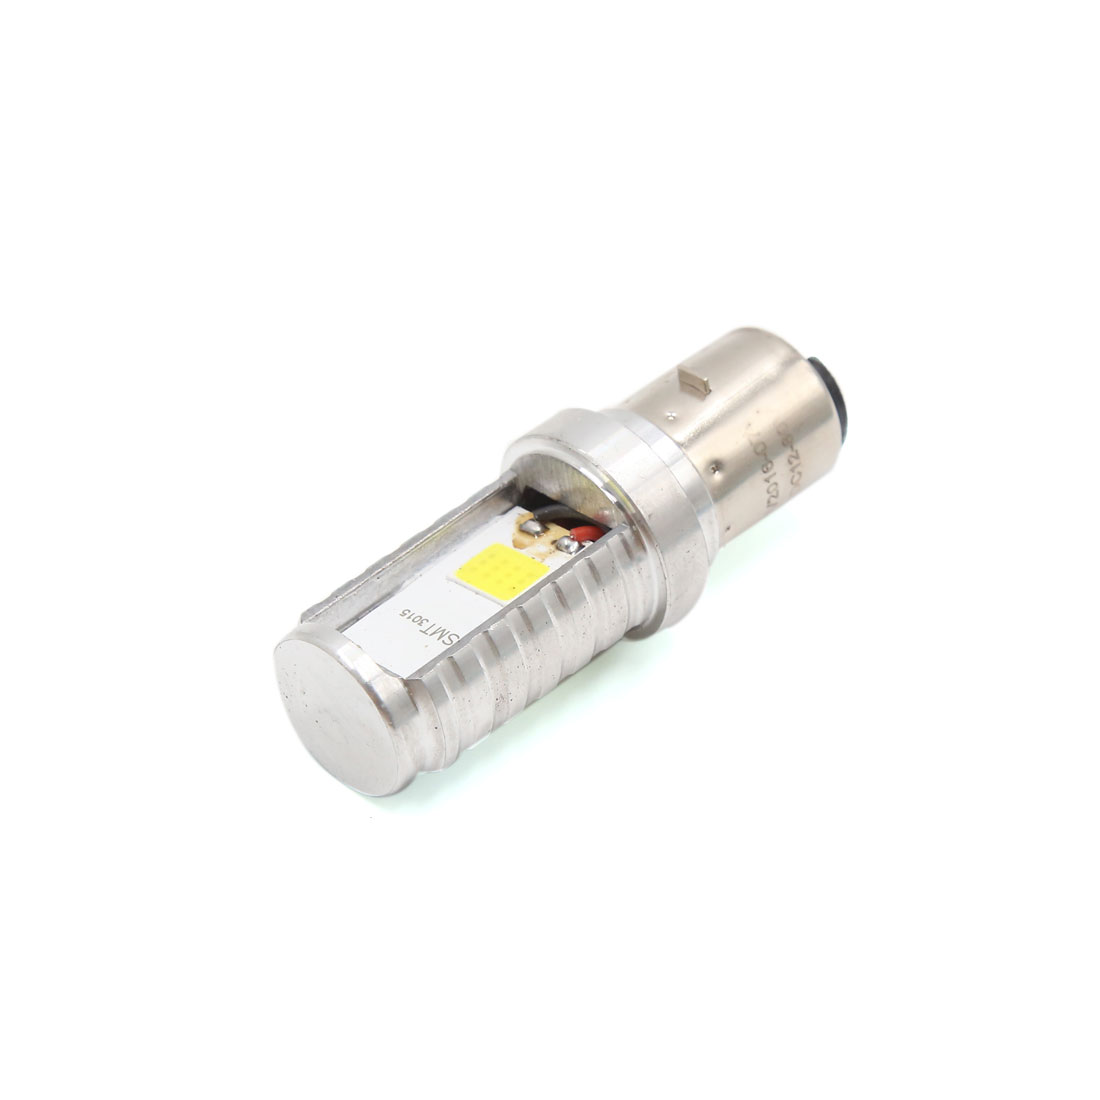 DC 9-80V 9W Dual Side White COB LED Motorcycle Headlight Spotlight Lamp Bulb